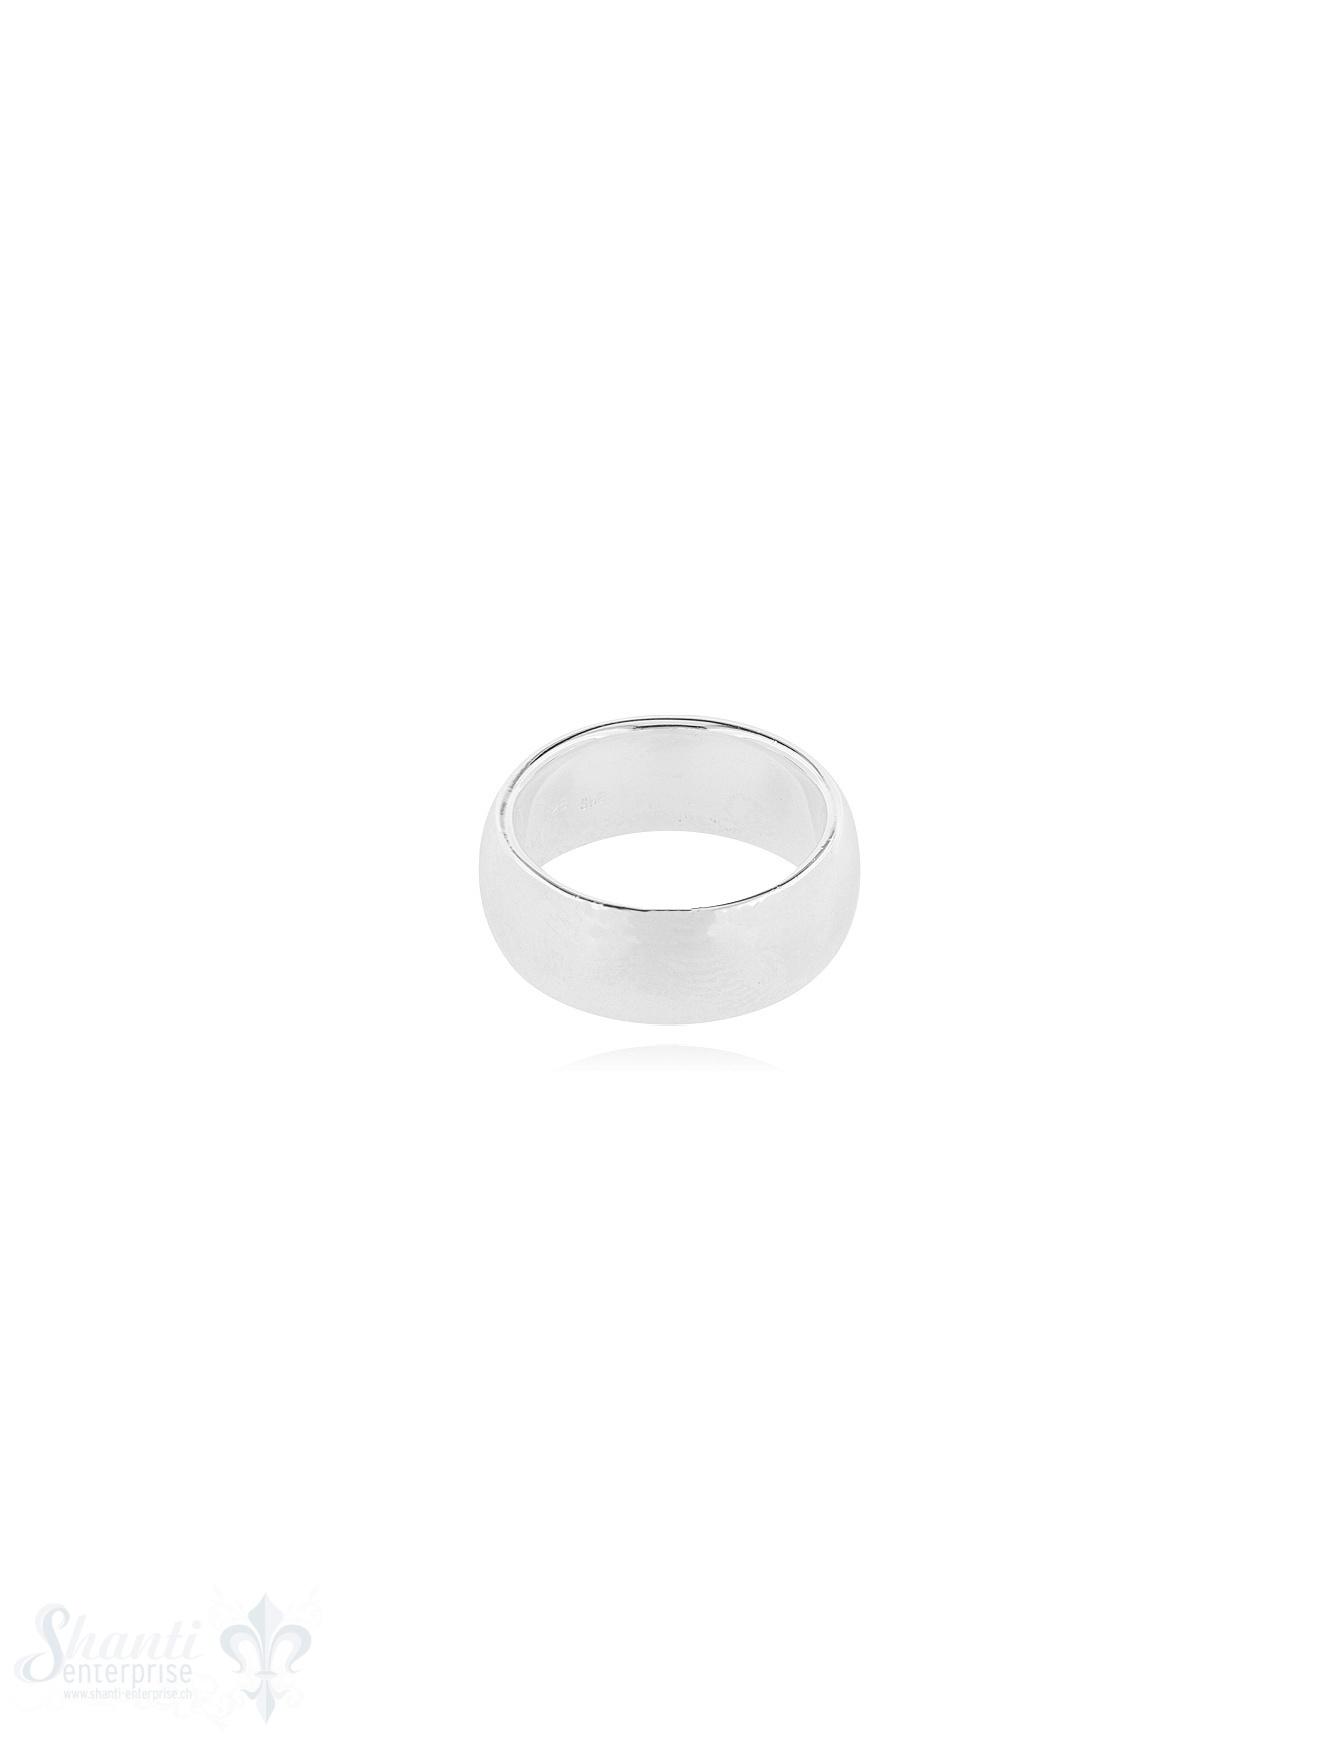 Silberring hell leicht gewölbt 7.5 mm breit